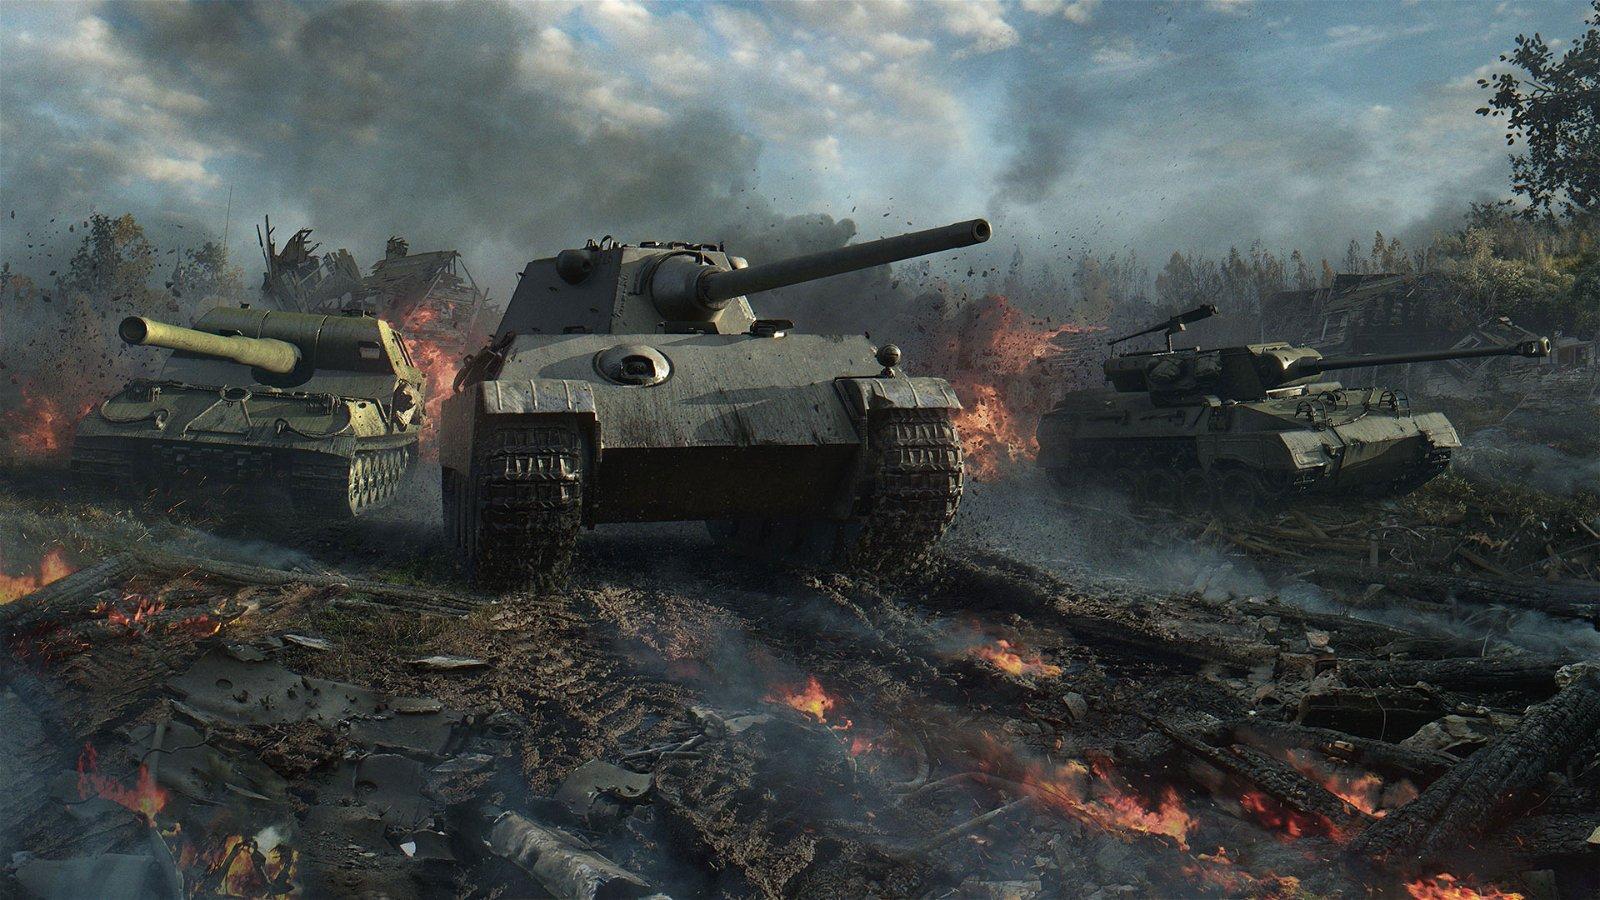 Wargaming Seattle, Developer of Free-to-Play Game World of Tanks, Shuts Down